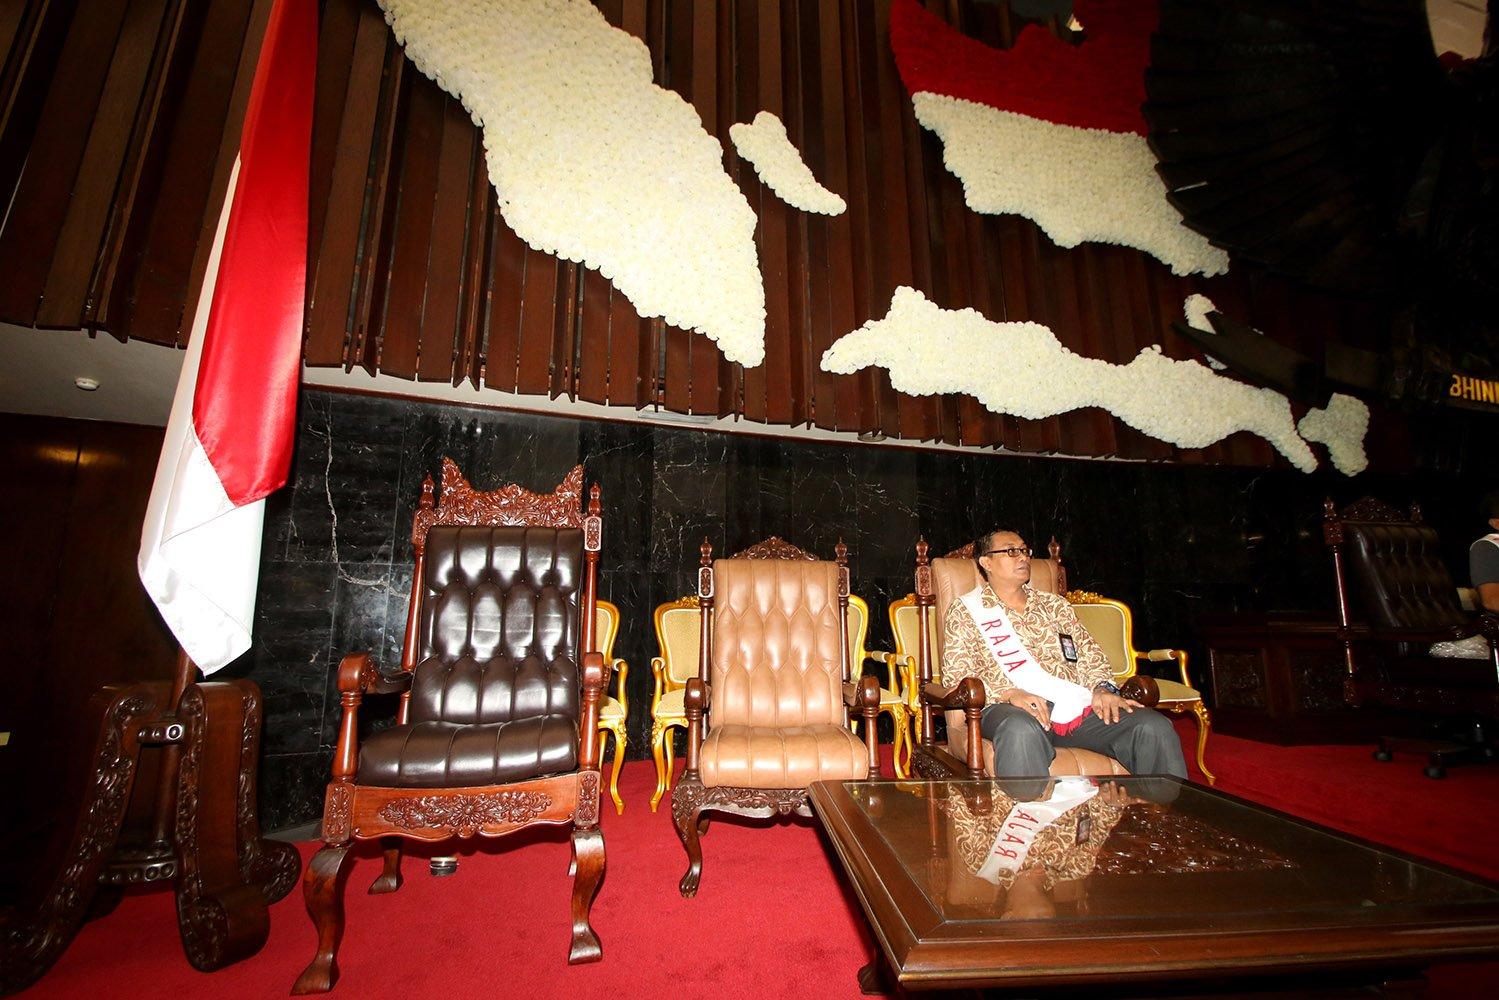 Pasukan Pengamanan Presiden (Paspampres) memasuki Ruang Rapat Paripurna satu saat melakukan persiapan kedatangan Raja Arab Saudi, Raja Salman bin Abdul Aziz di Kompleks Parlemen, Senayan, Jakarta, Sabtu (25/2). Ketua DPR Setya Novanto memastikan kesiapan parlemen menyambut Raja Salman sudah 80 persen.